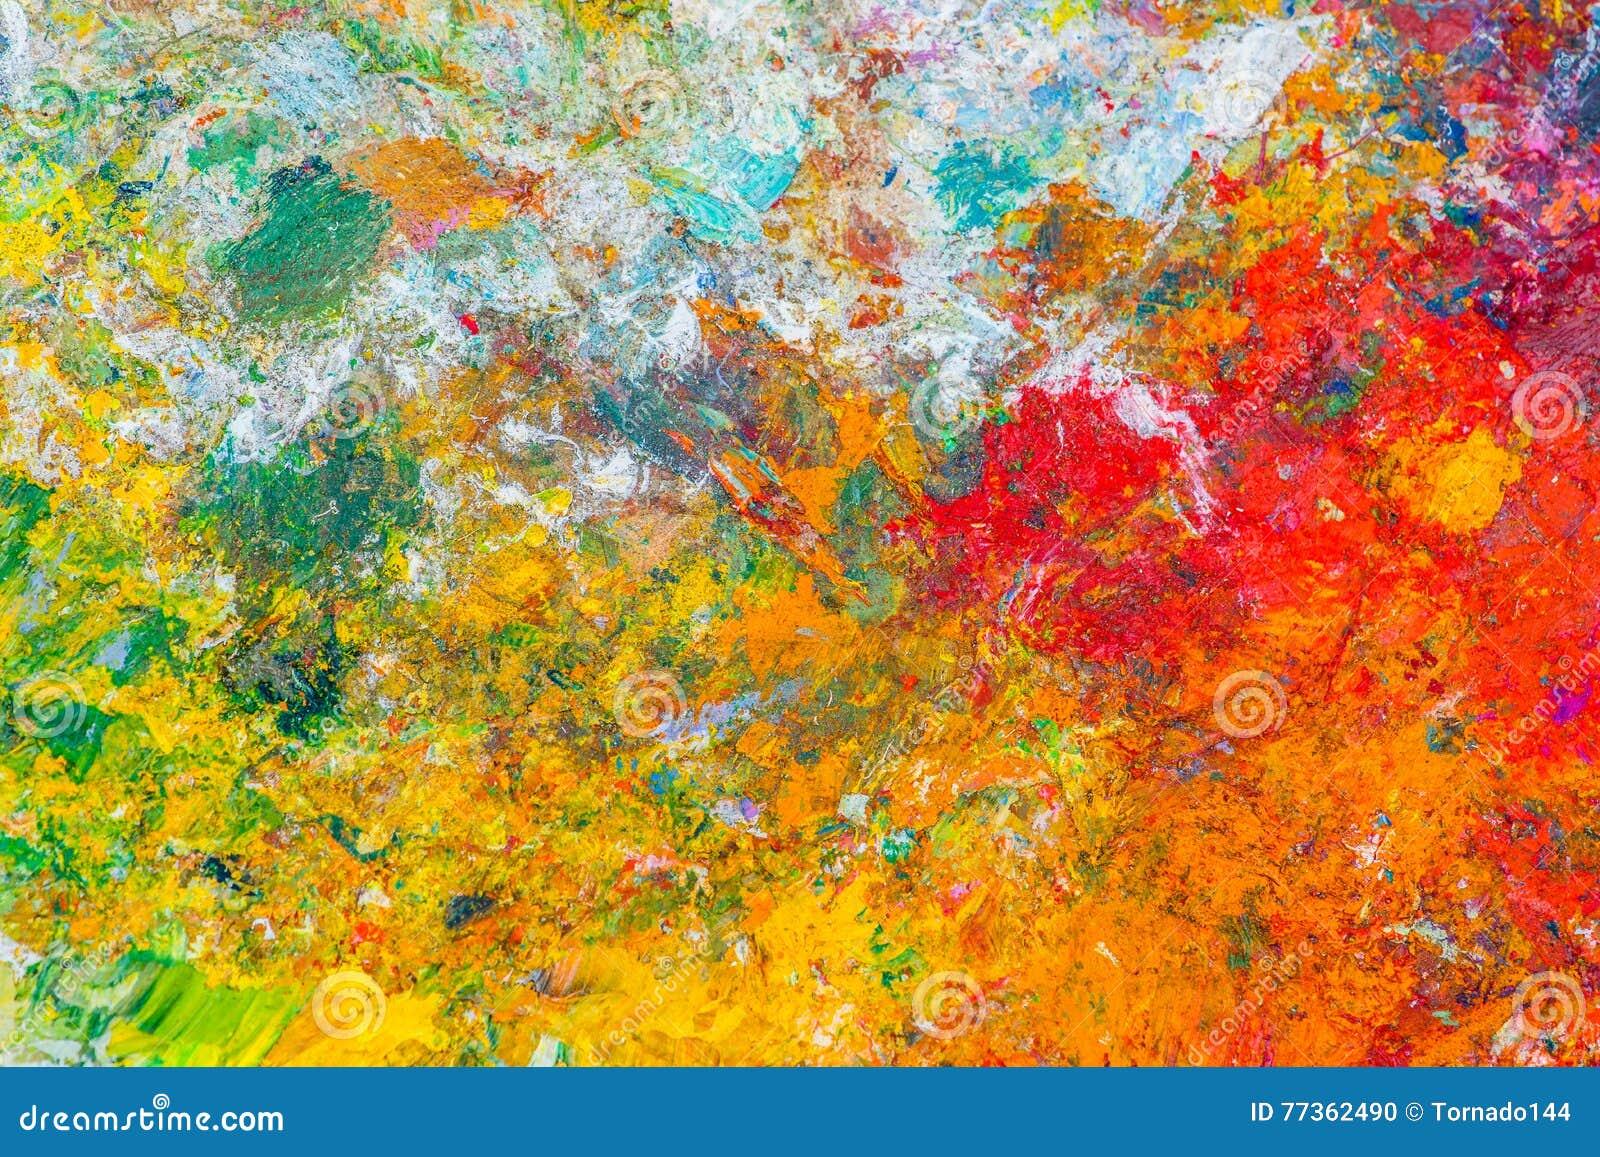 Kolorowe wzór abstrakcyjne